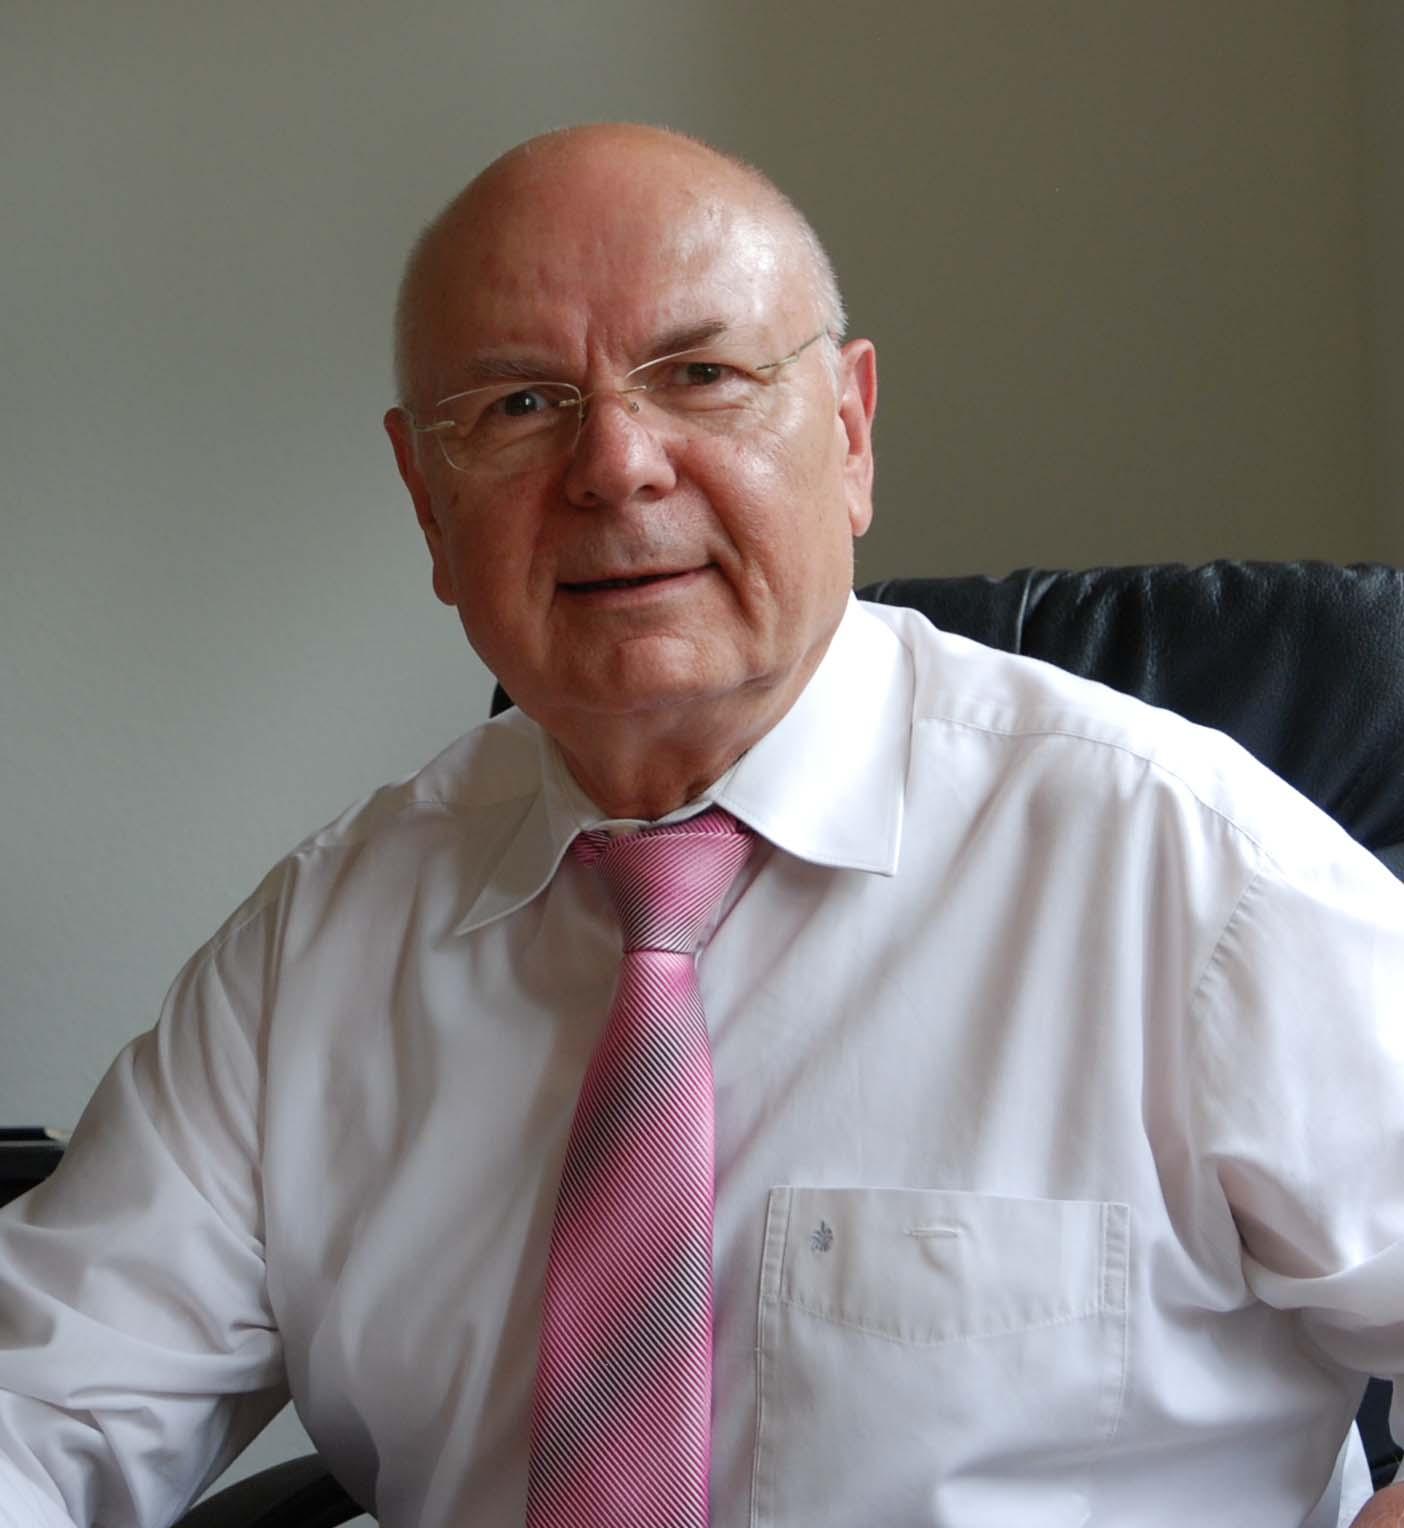 Rainer Eckelt